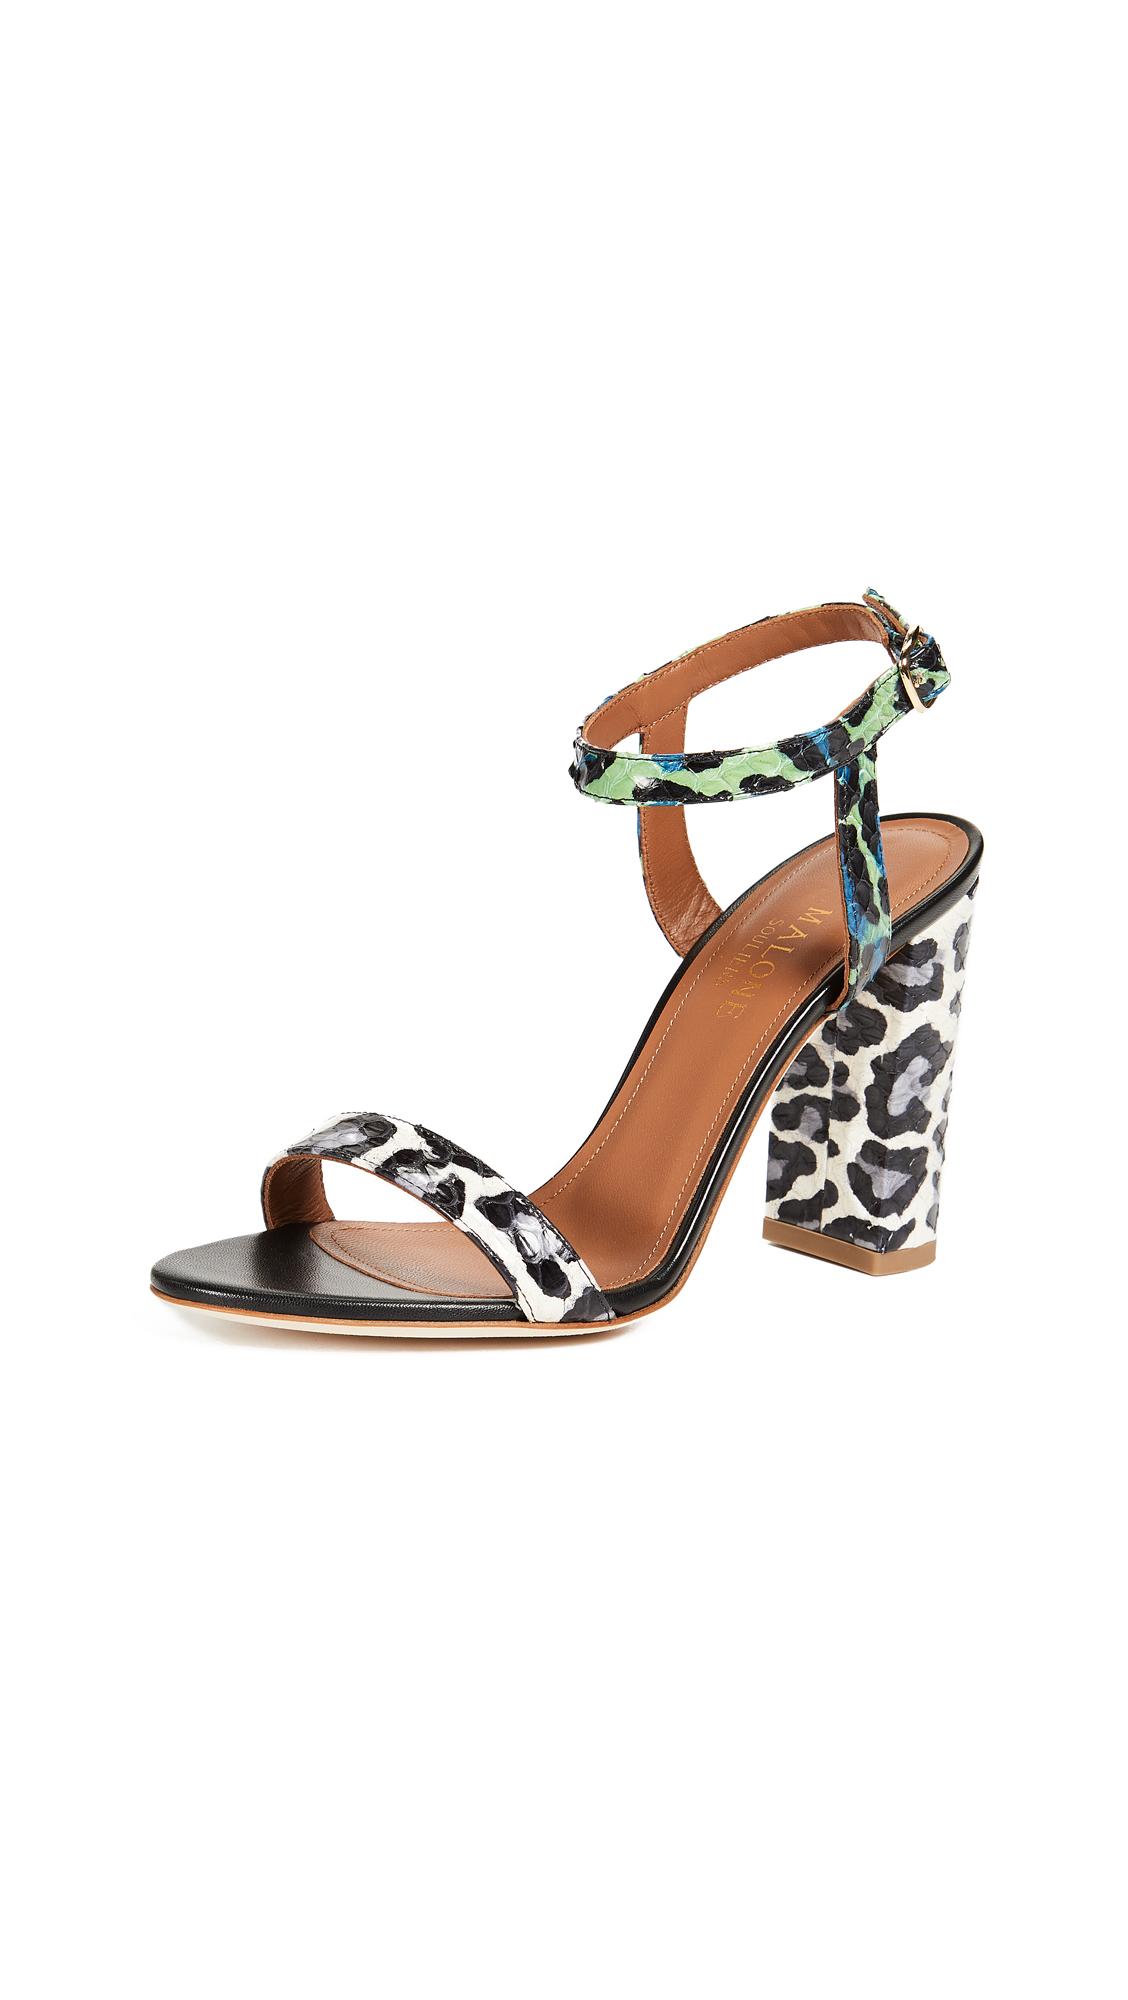 Malone Souliers Ladida Sandal - Grey/Green Leopard/Black